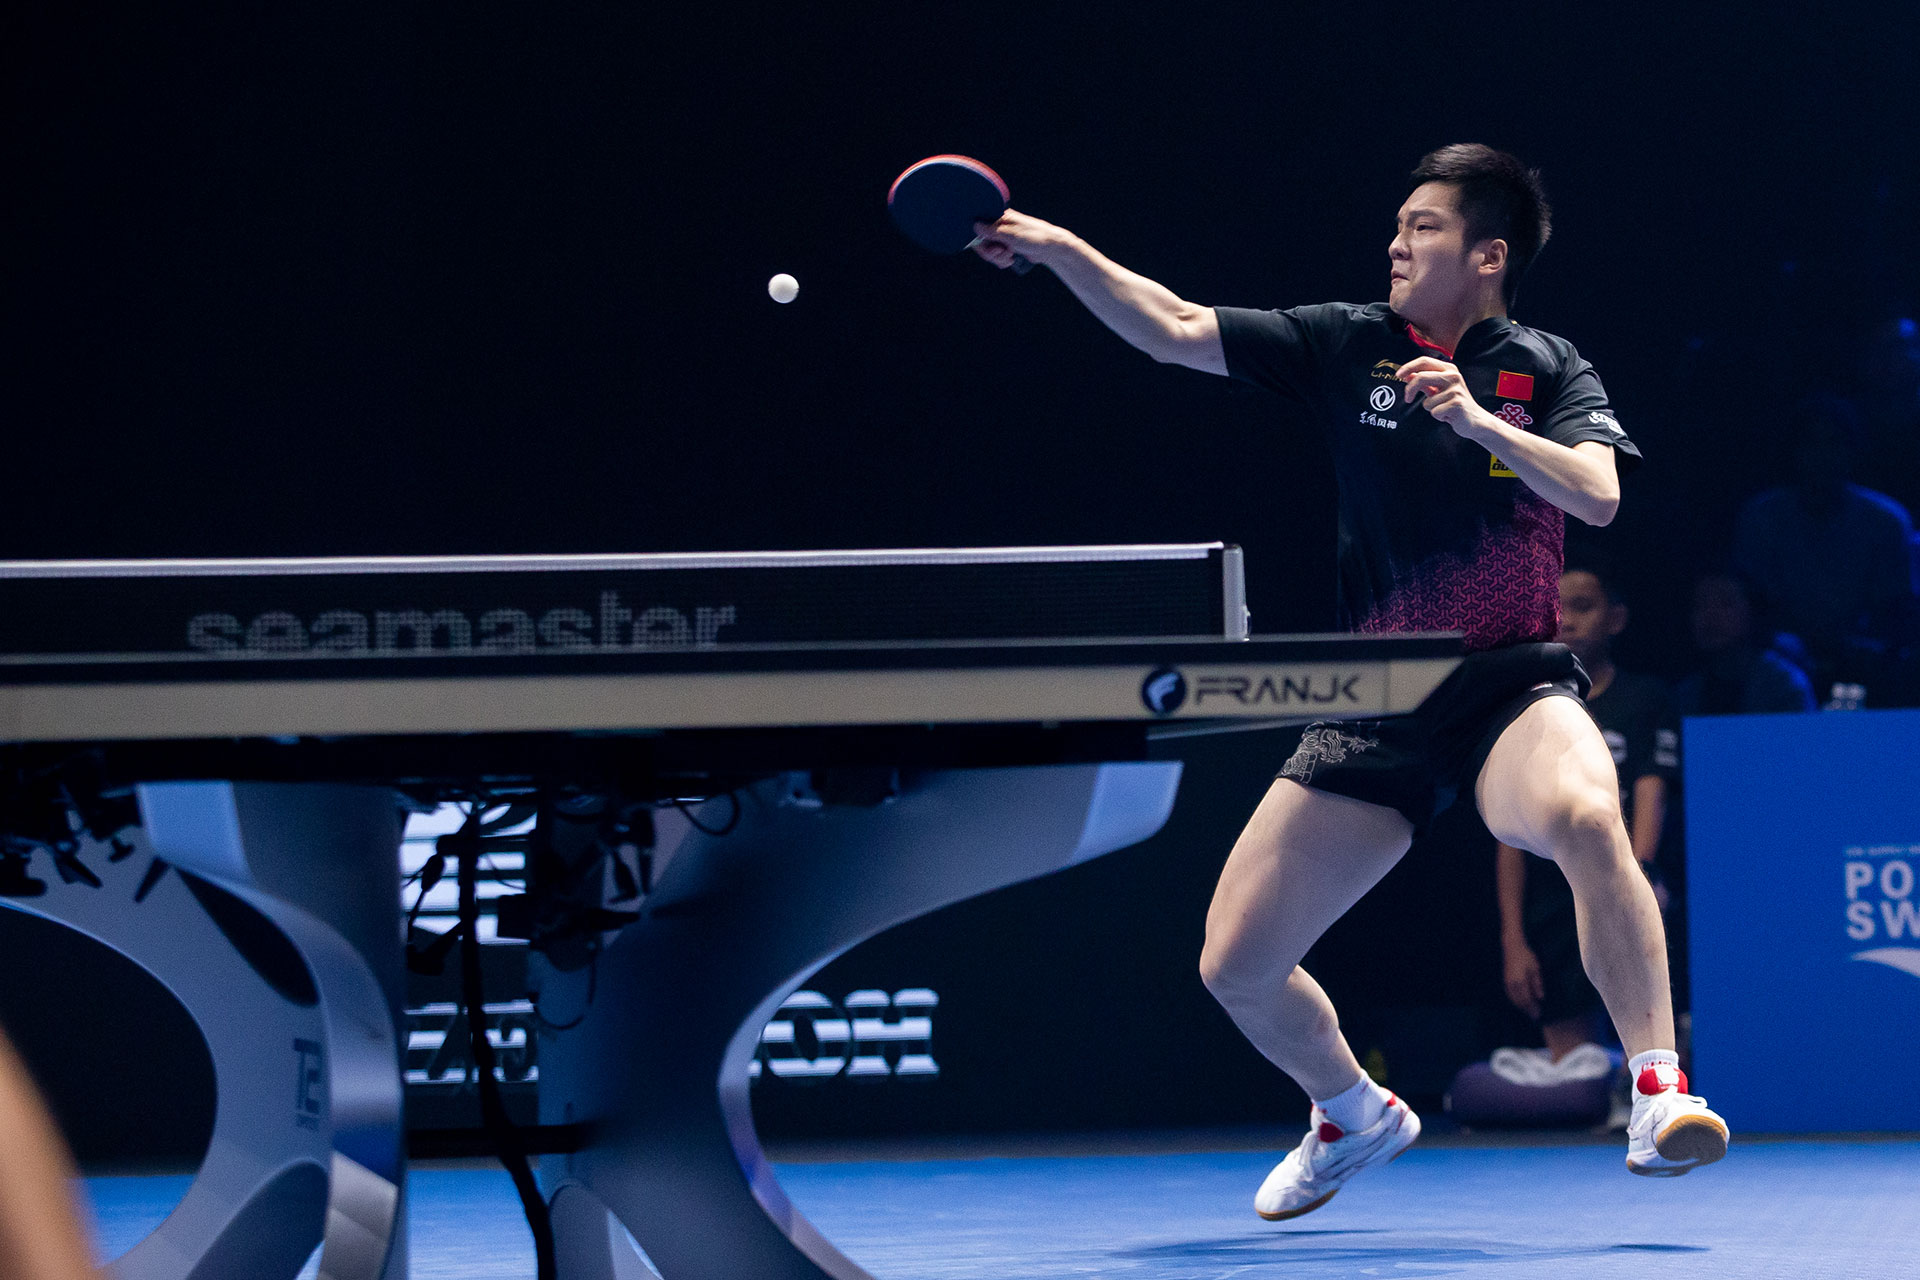 20190719_Match12_R16_FANzhendong_vs_CALDERANOhugo_00897-_HIGHRES1